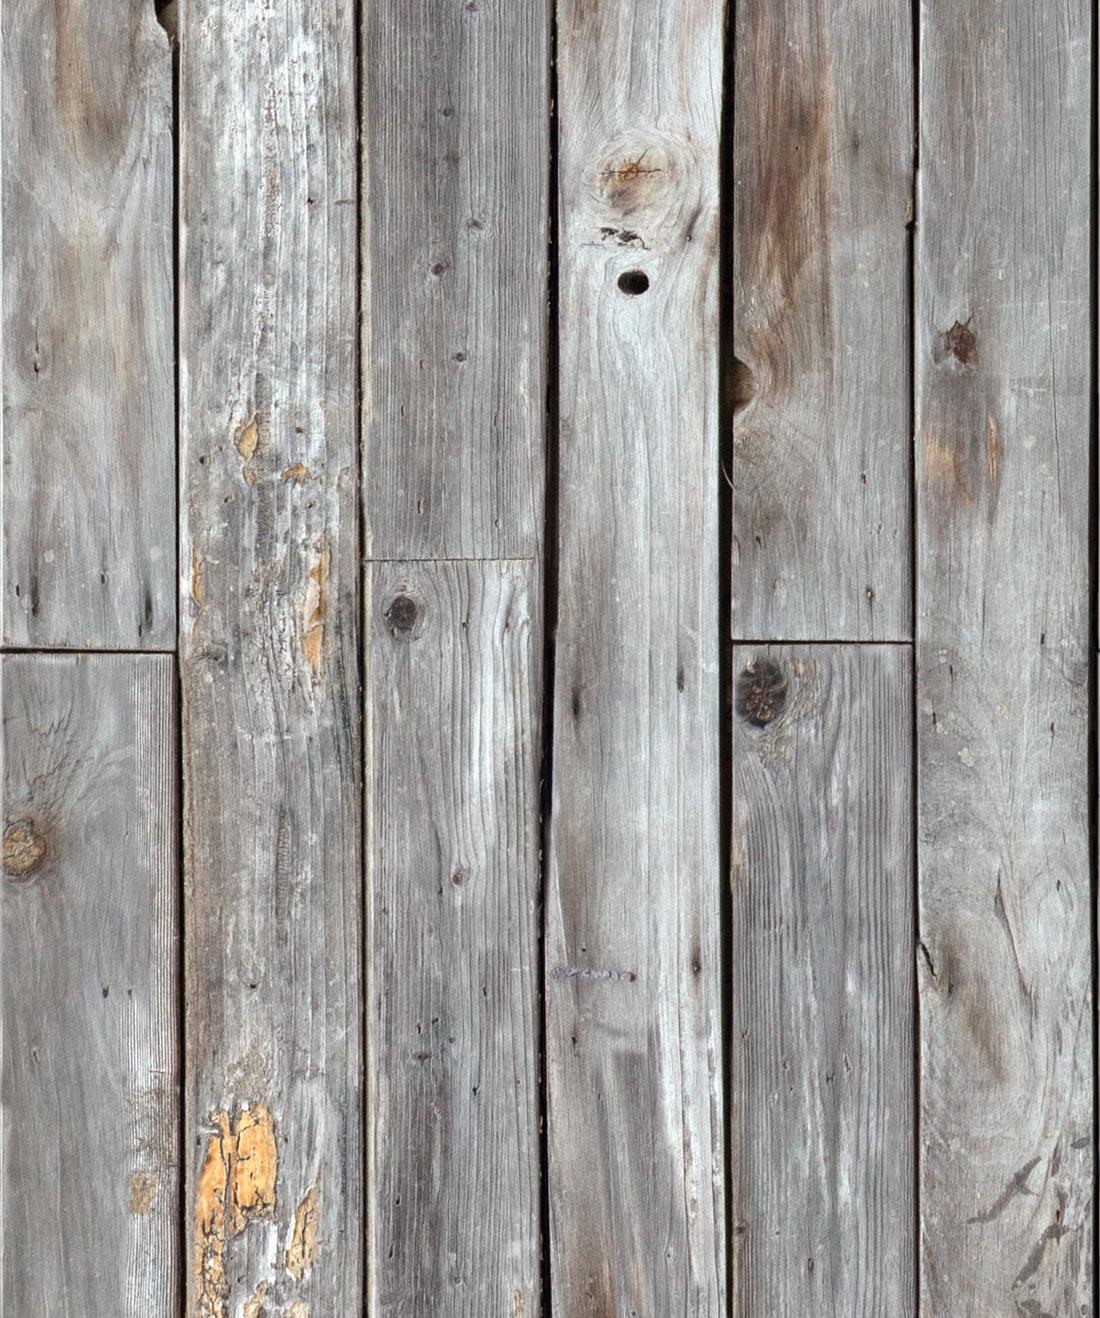 Rustic Wood Panels Wallpaper